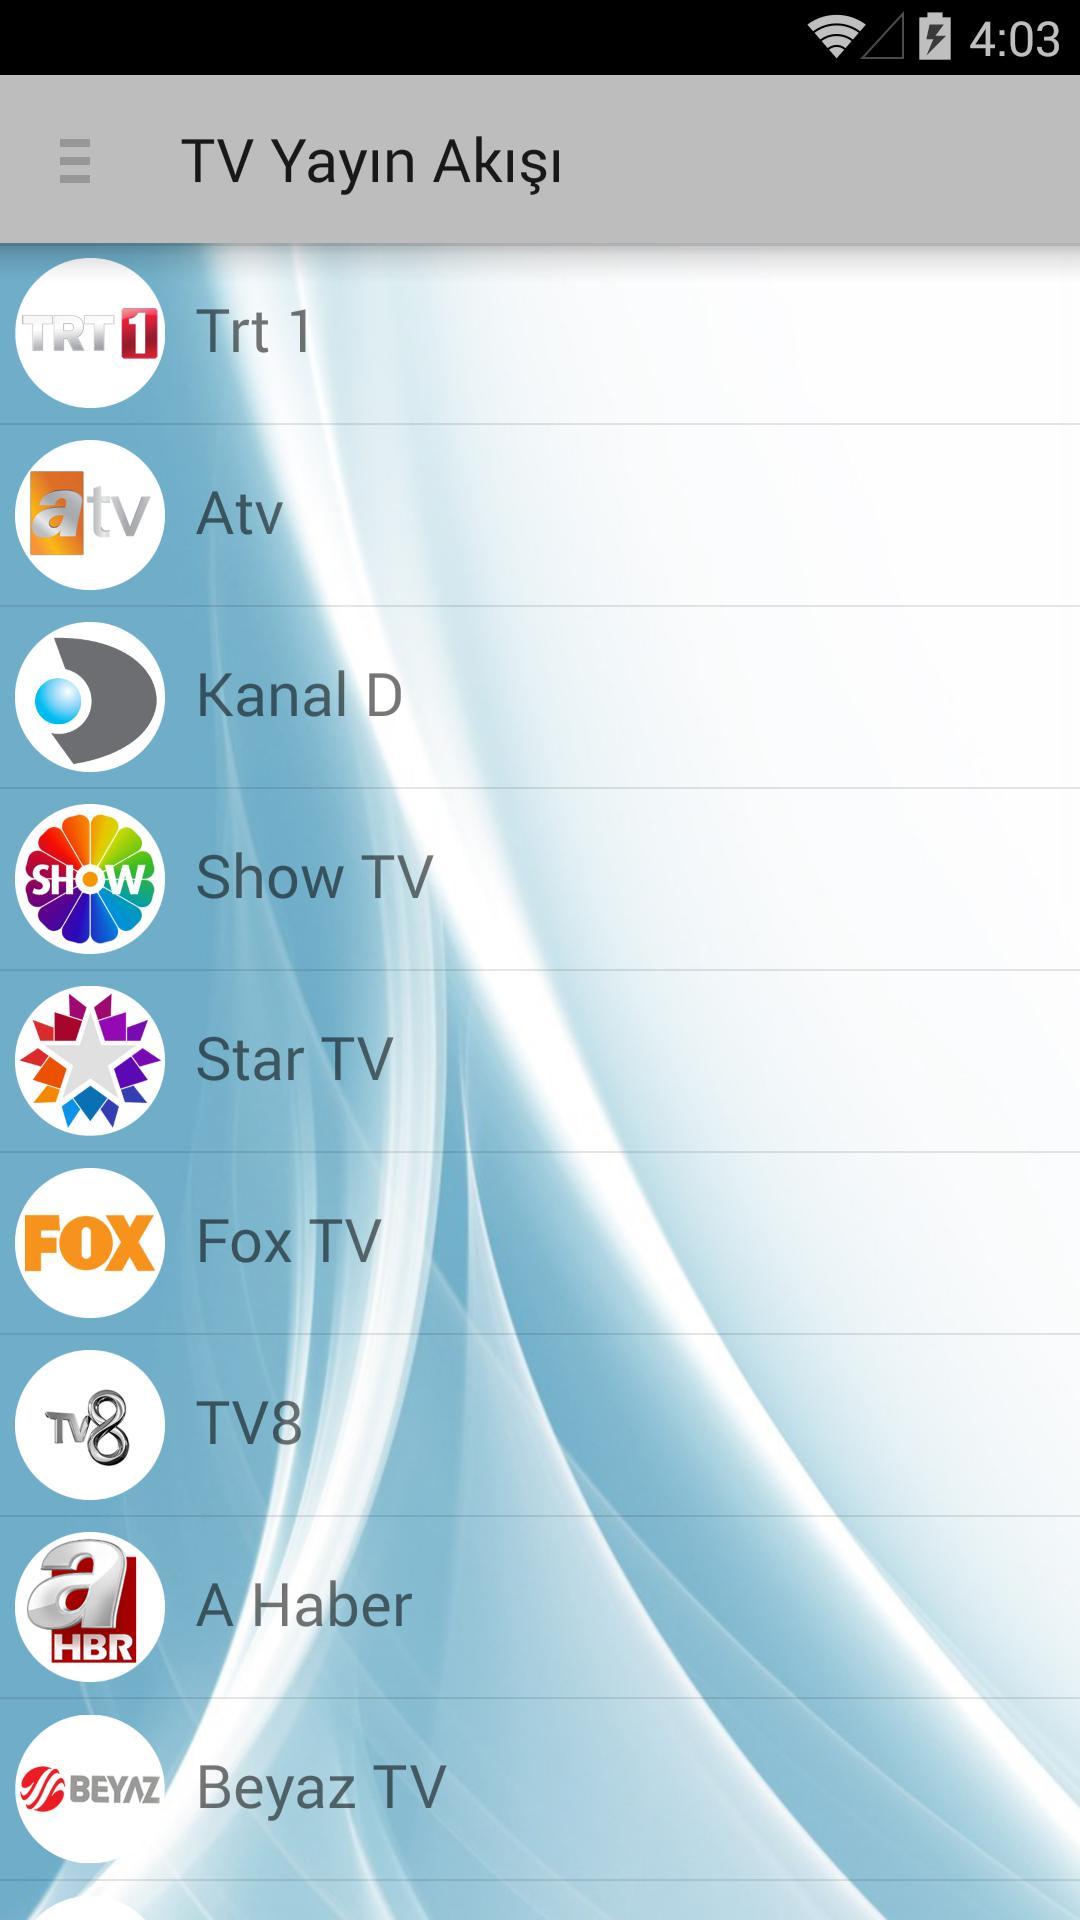 TV Yayın Akışı for Android - APK Download